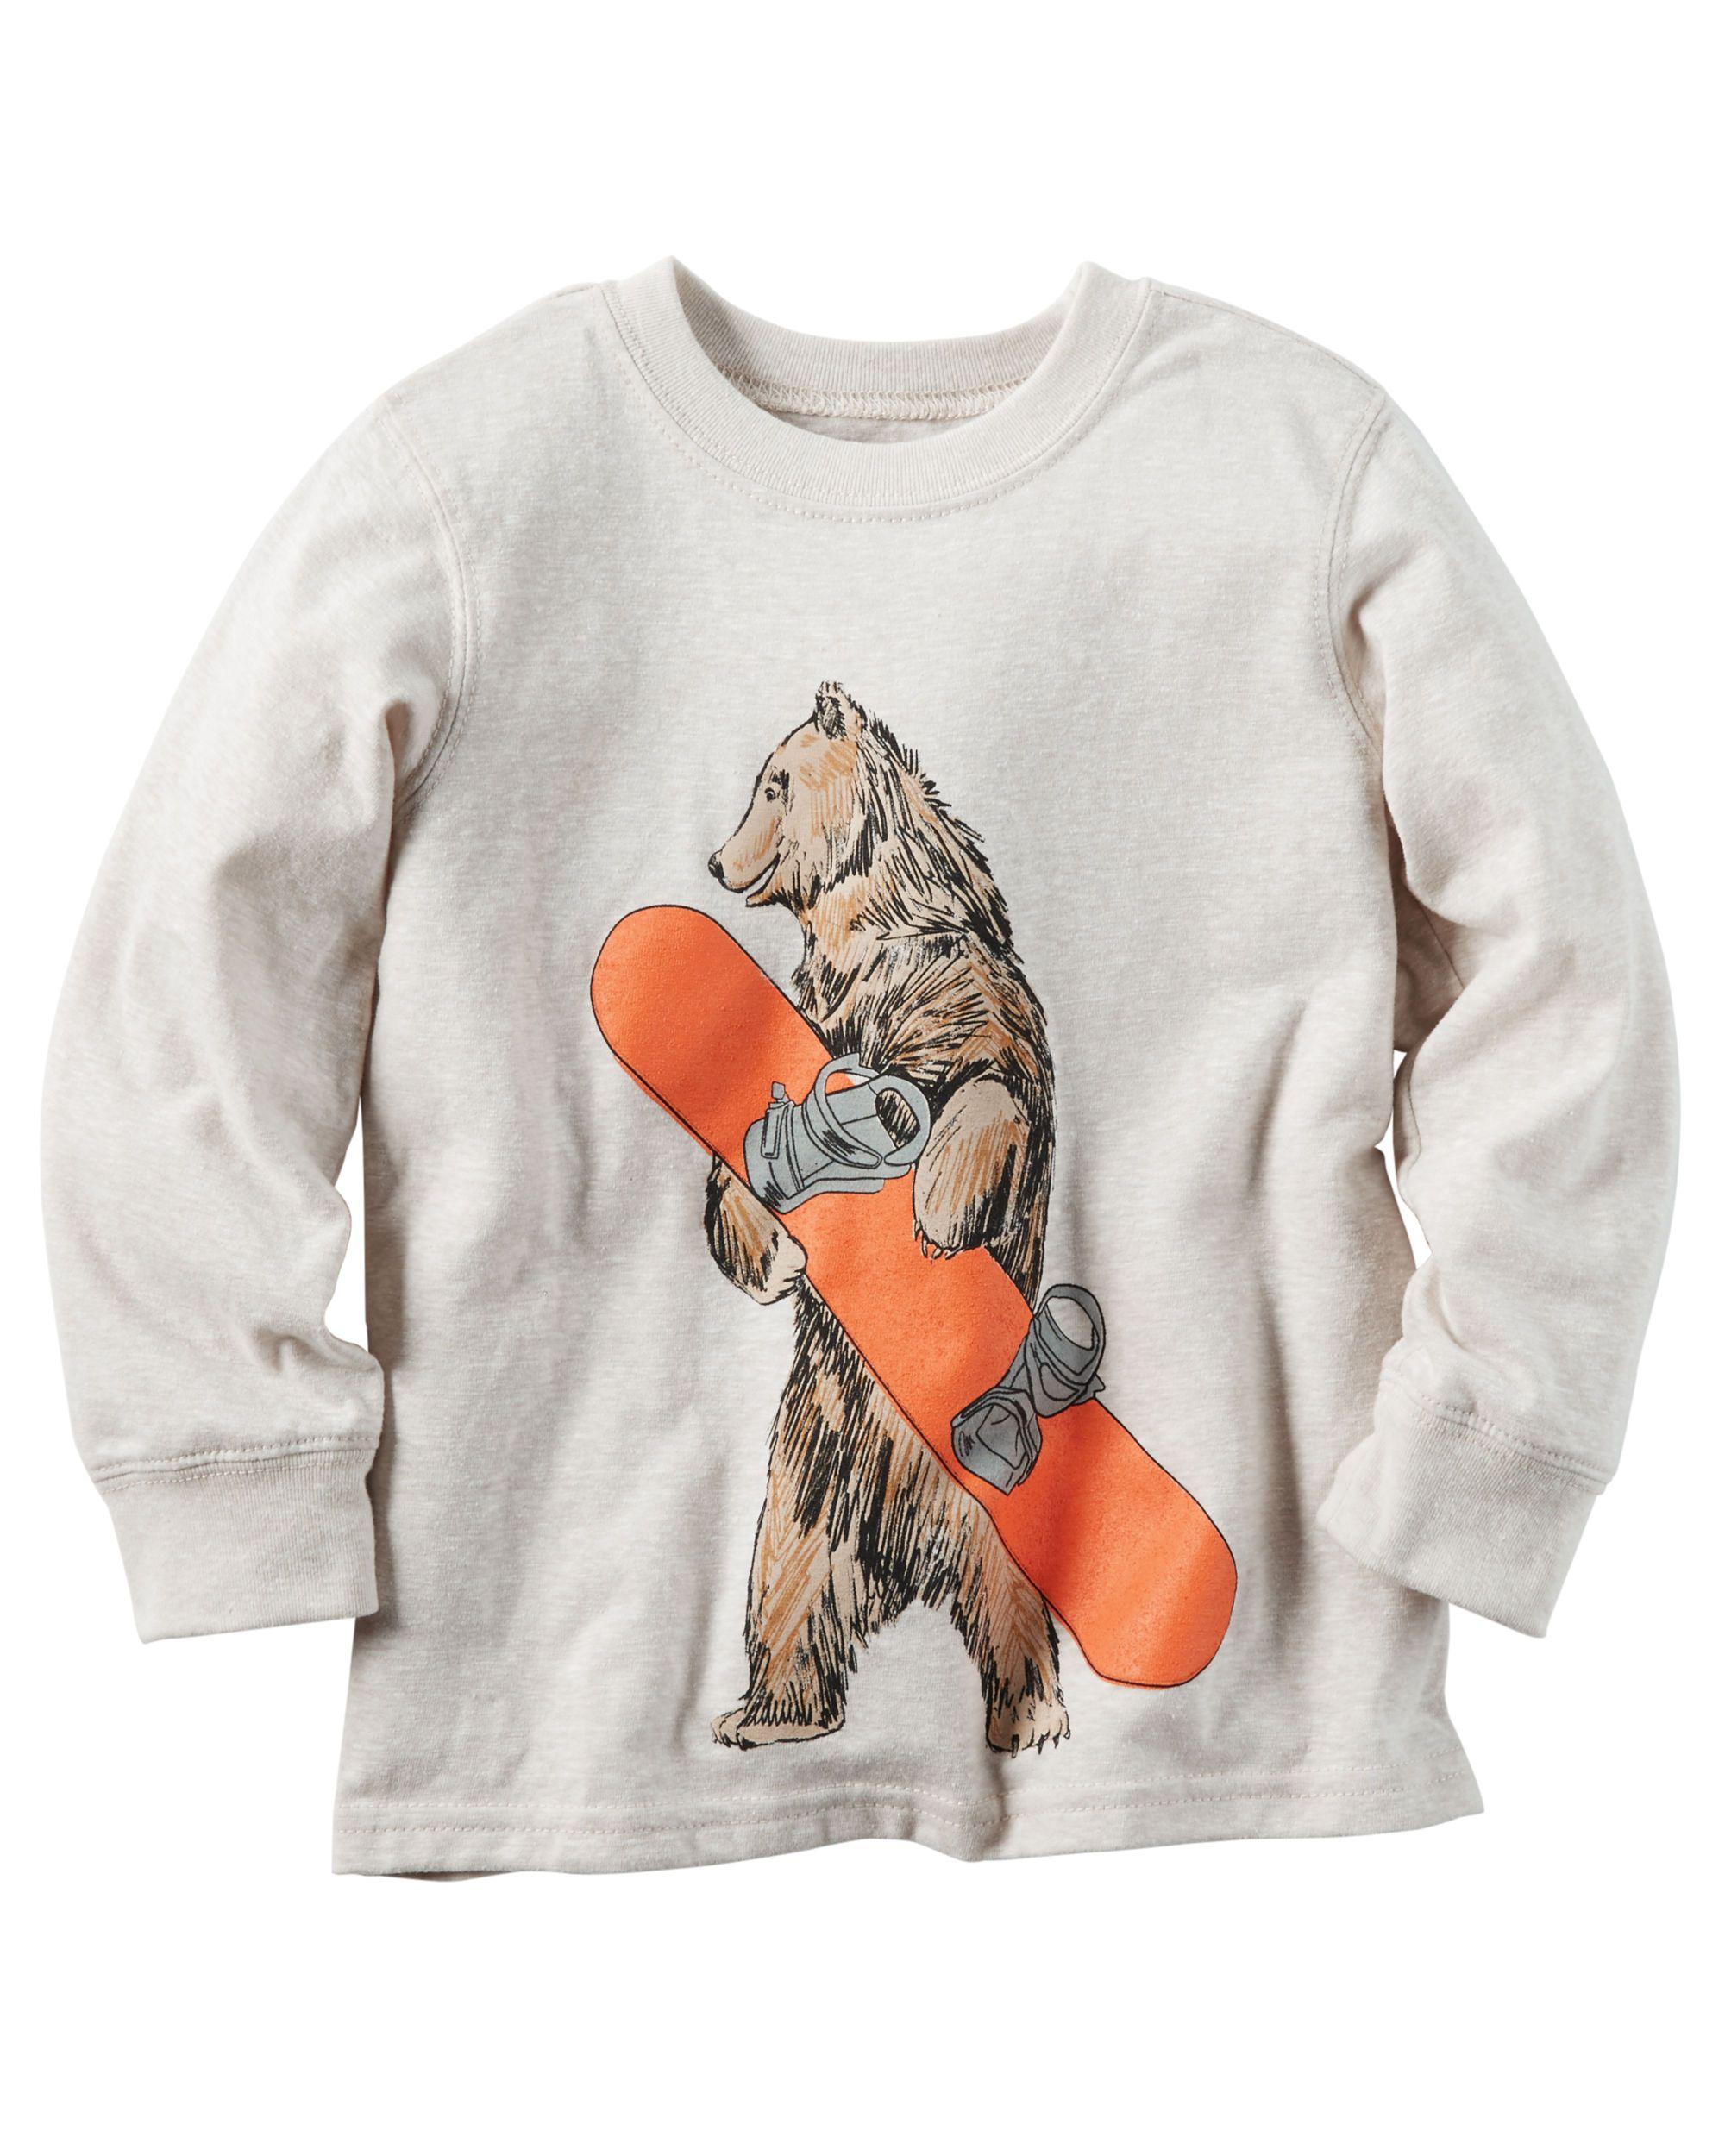 e4a8f0ca0bfa Baby Boy Long-Sleeve Snowboard Bear Graphic Tee | Carters.com ...